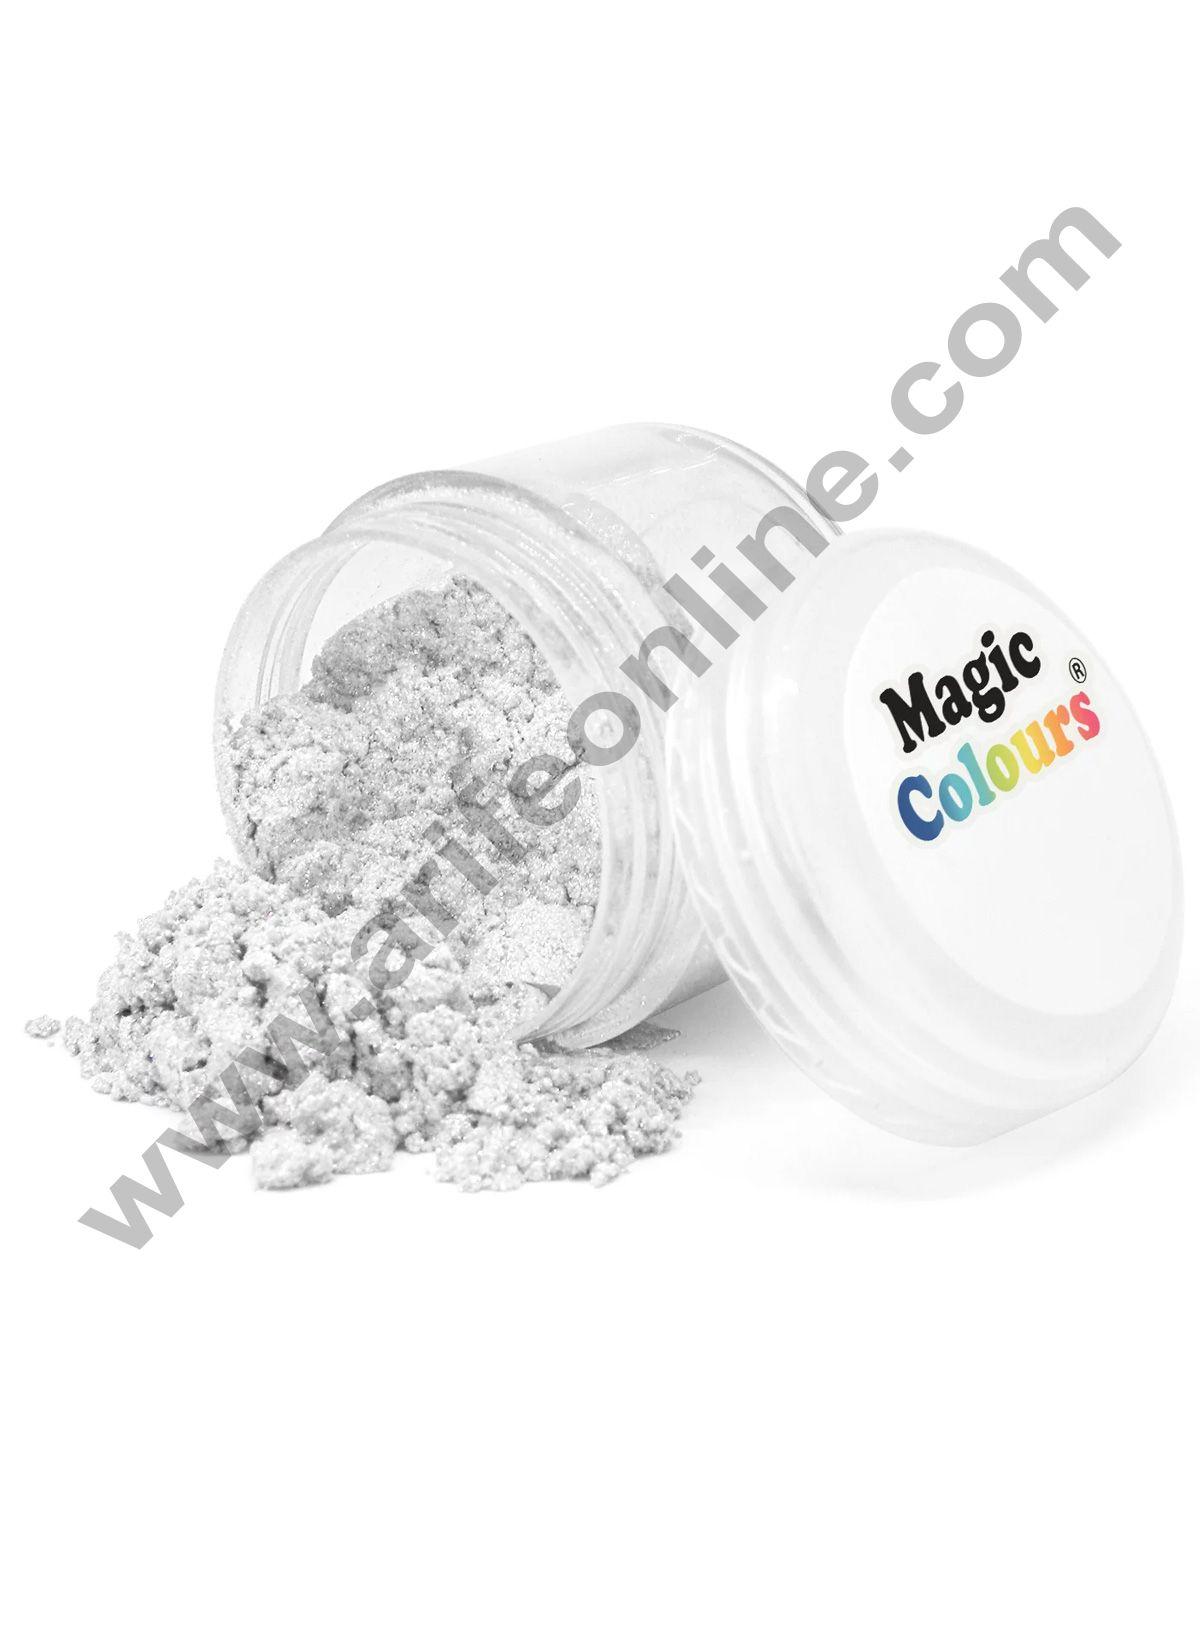 Magic Colours™ Edible Lustre Dust - Pearl Ivory (8 ml)